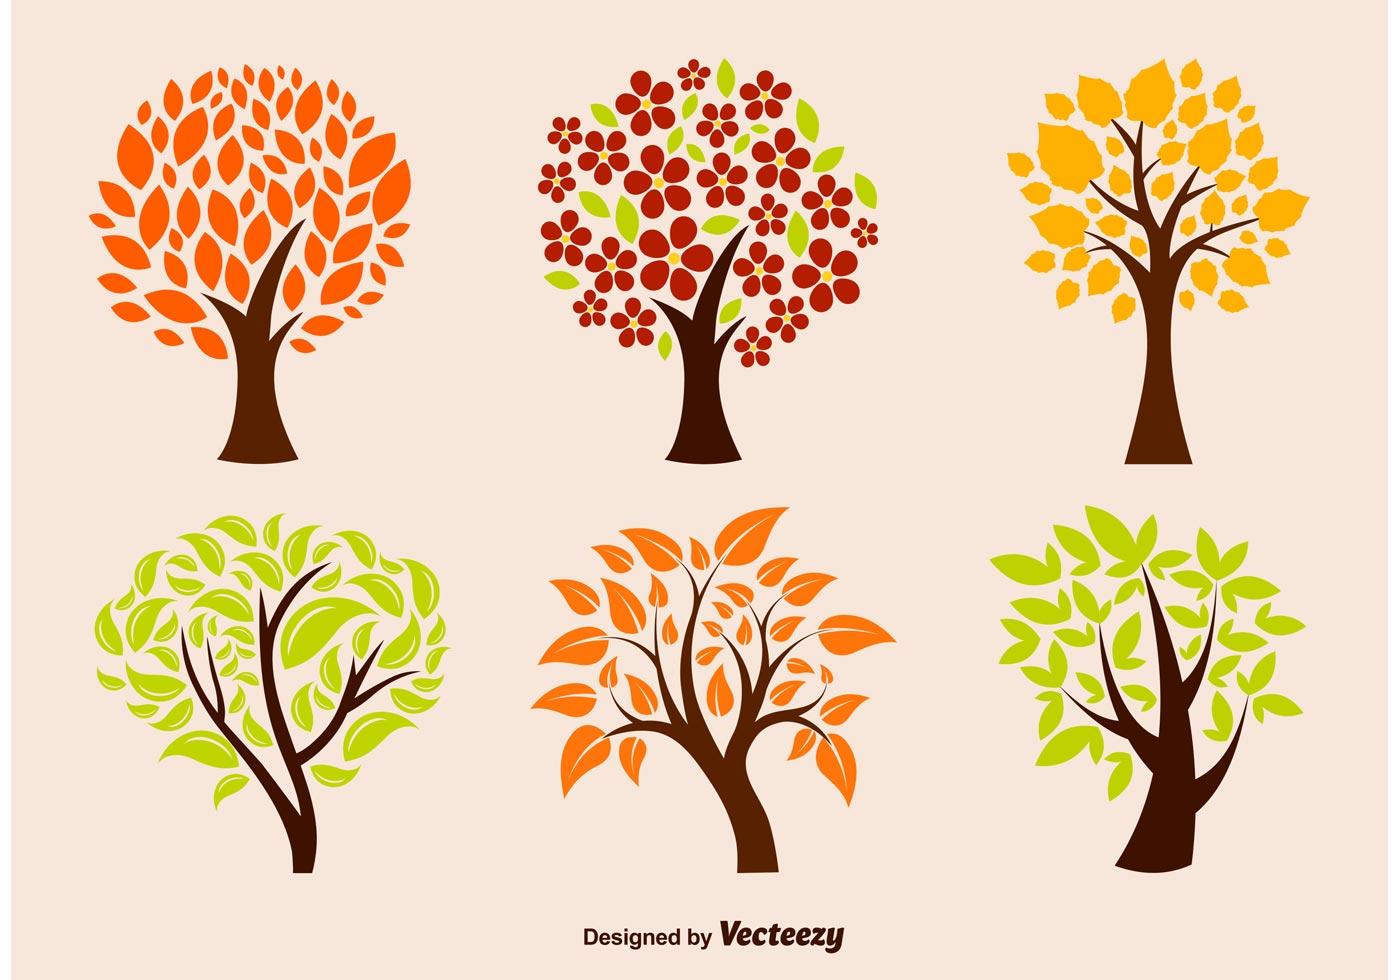 Eco Tree Vectors - Download Free Vector Art, Stock ...